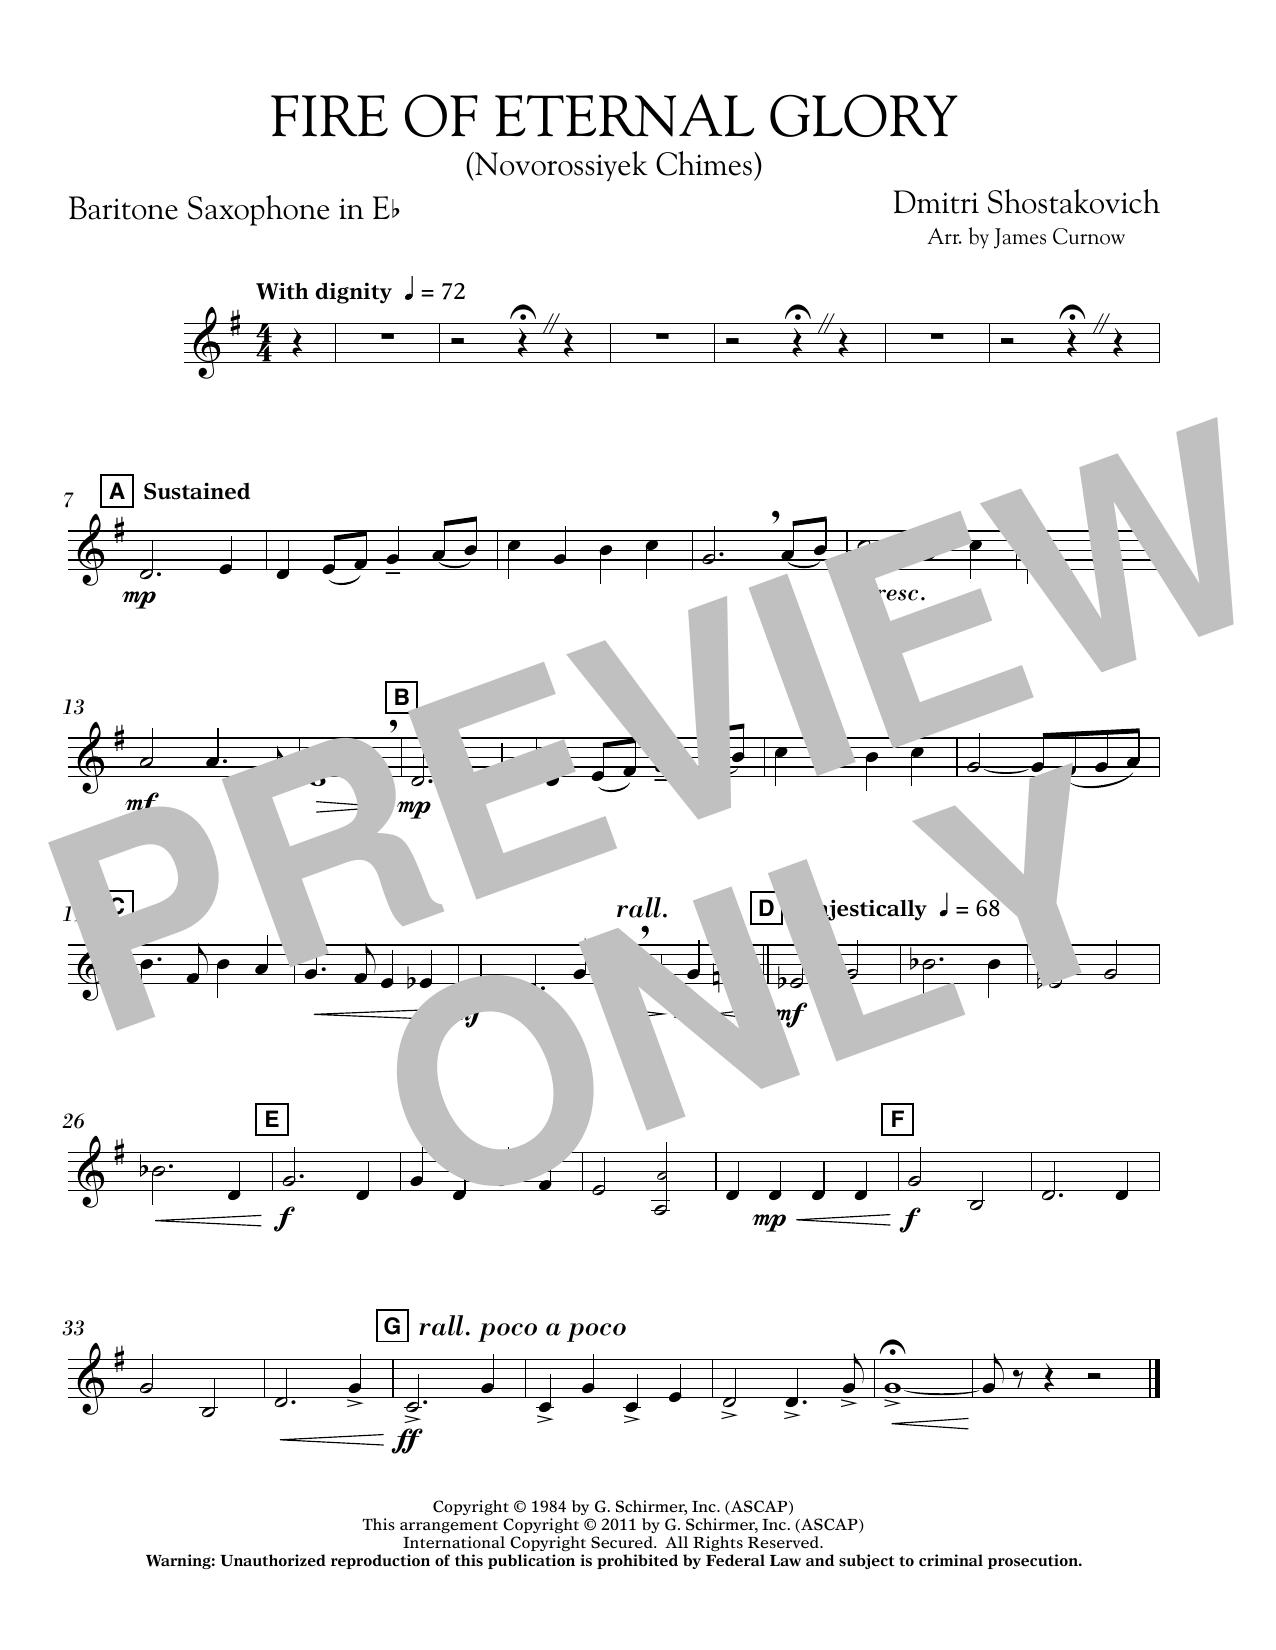 James Curnow Fire of Eternal Glory (Novorossiyek Chimes) - Eb Baritone Saxophone sheet music notes printable PDF score